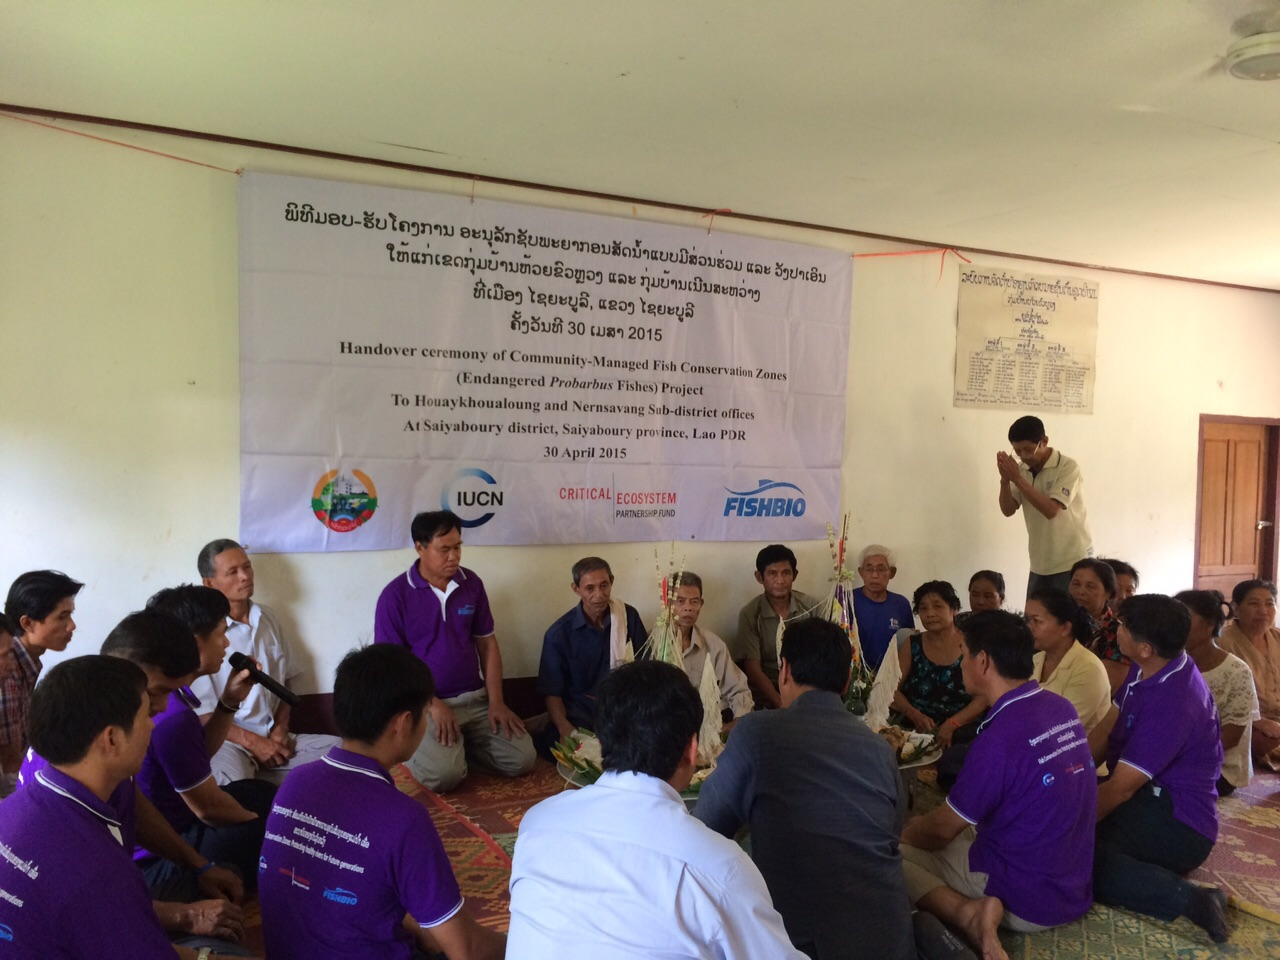 Basi Ceremony at FCZ Handover Workshop